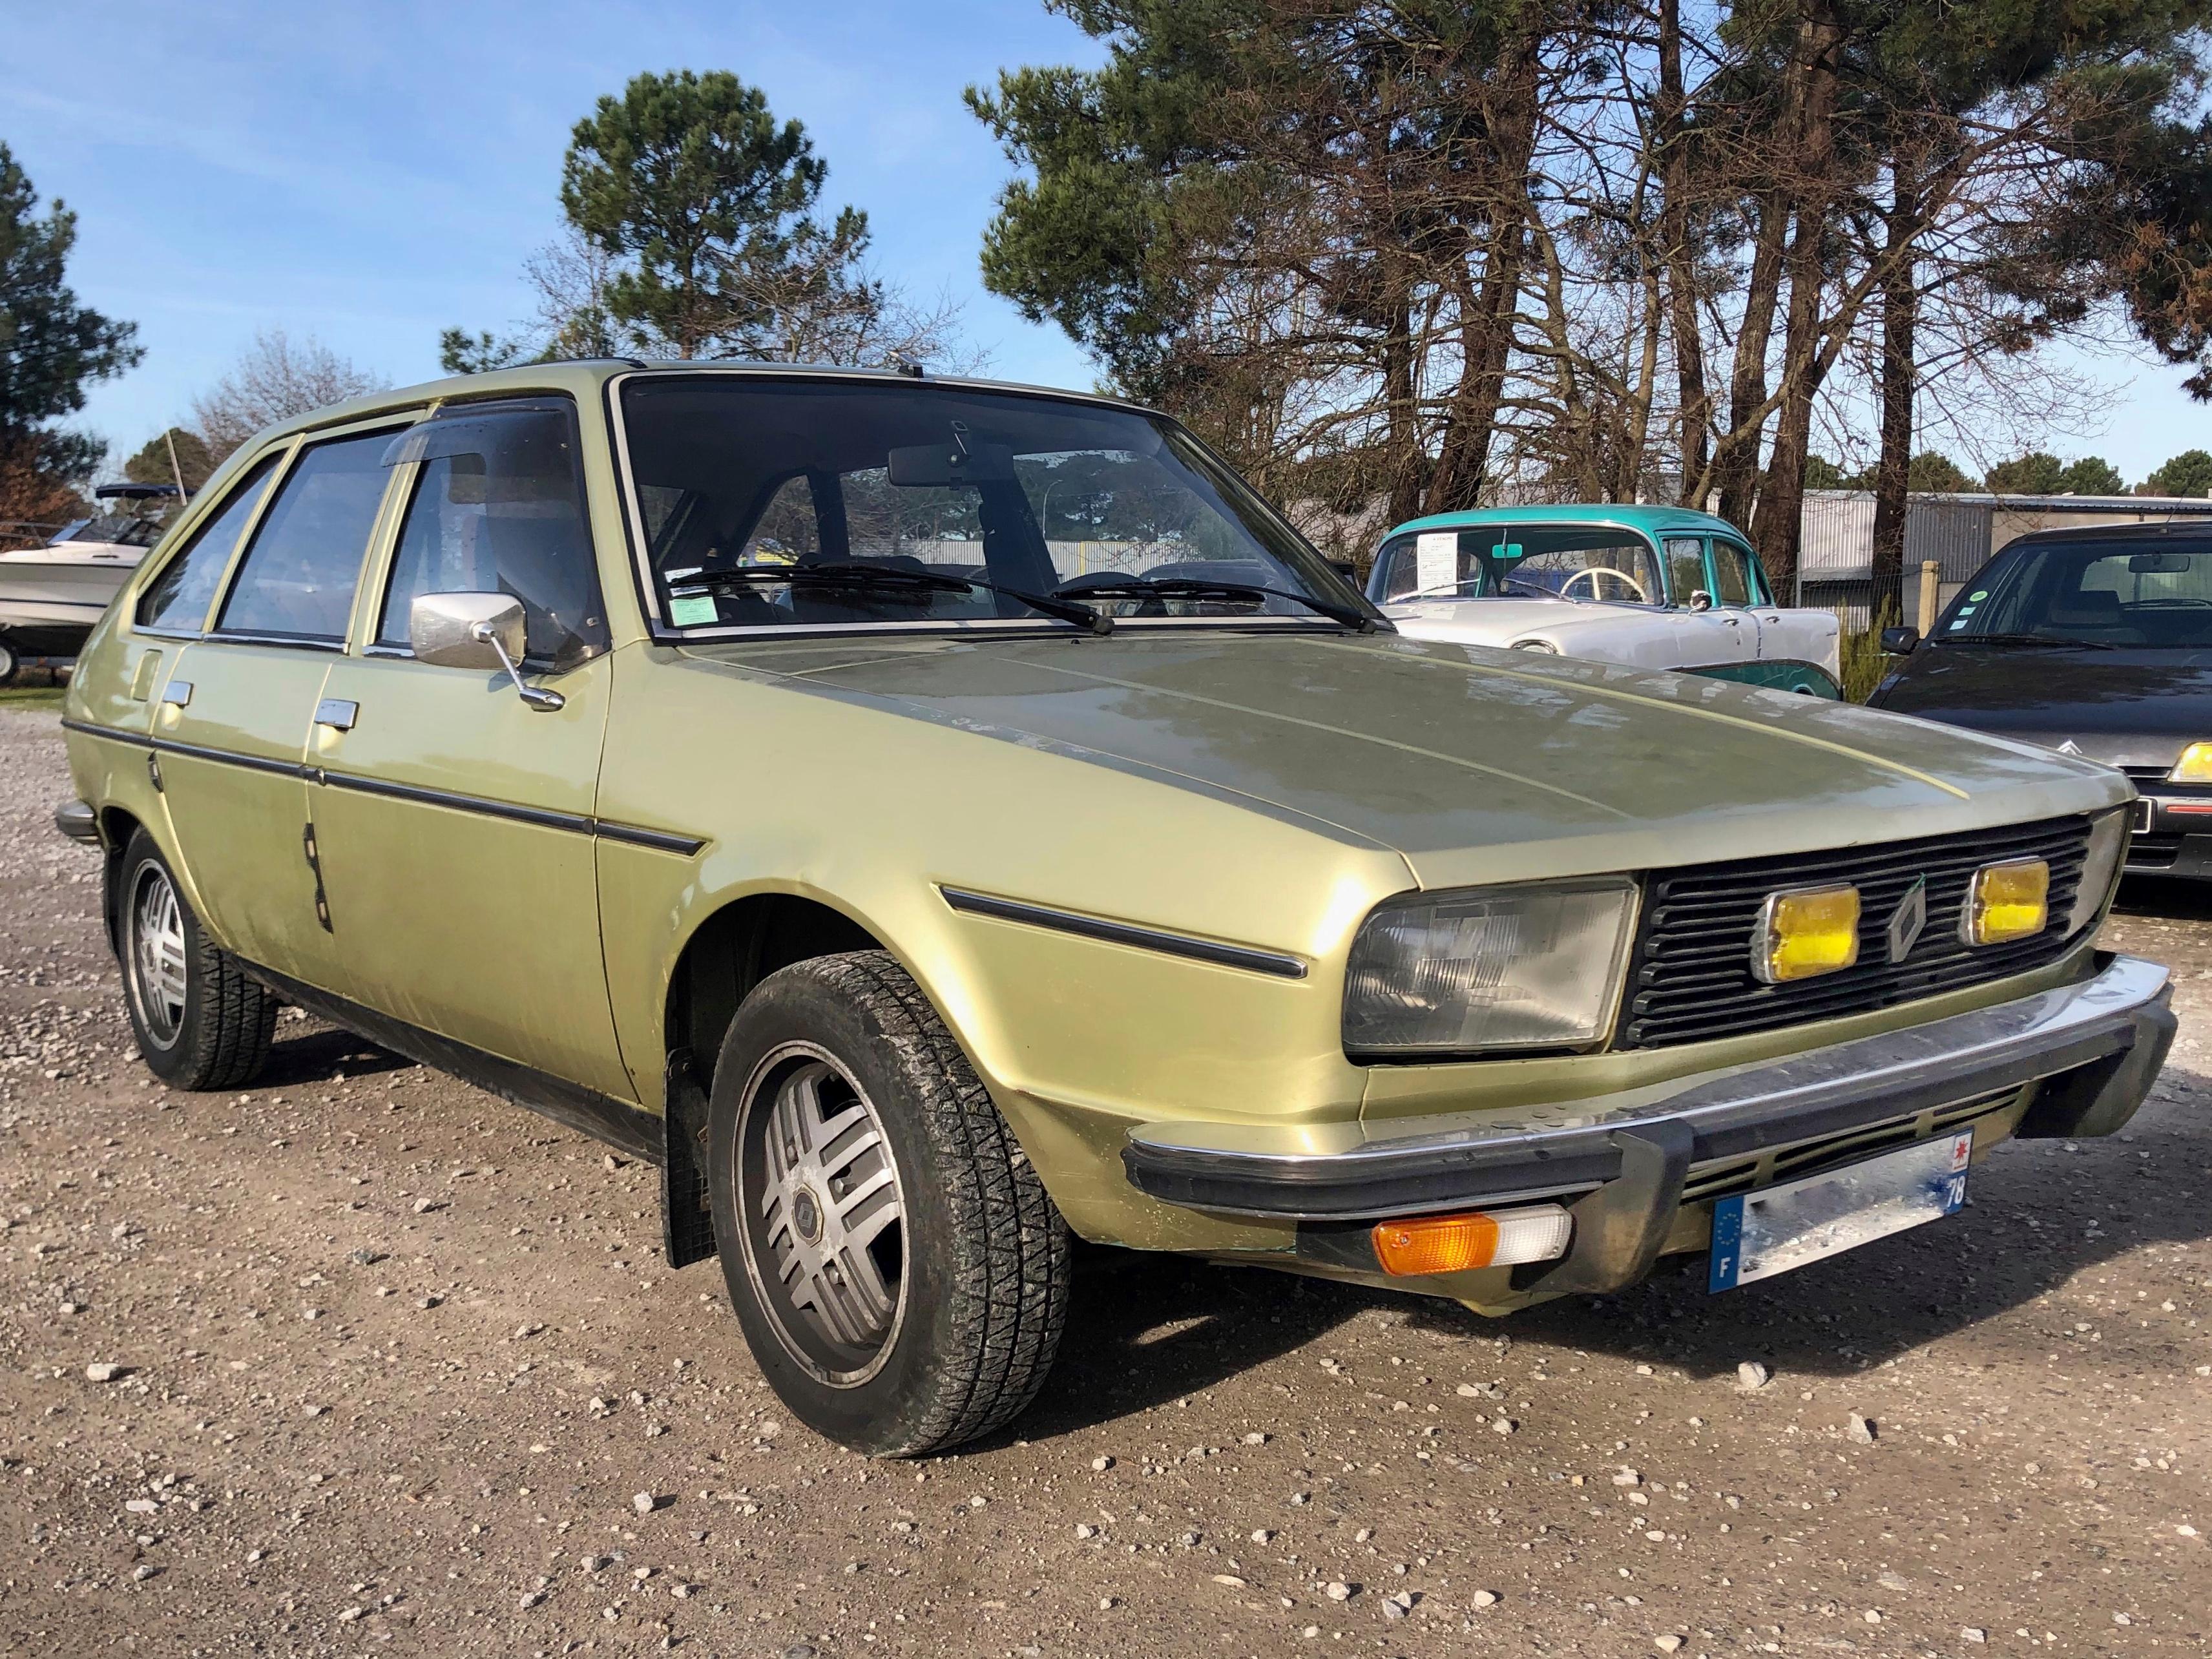 A vendre R20 Renault TS